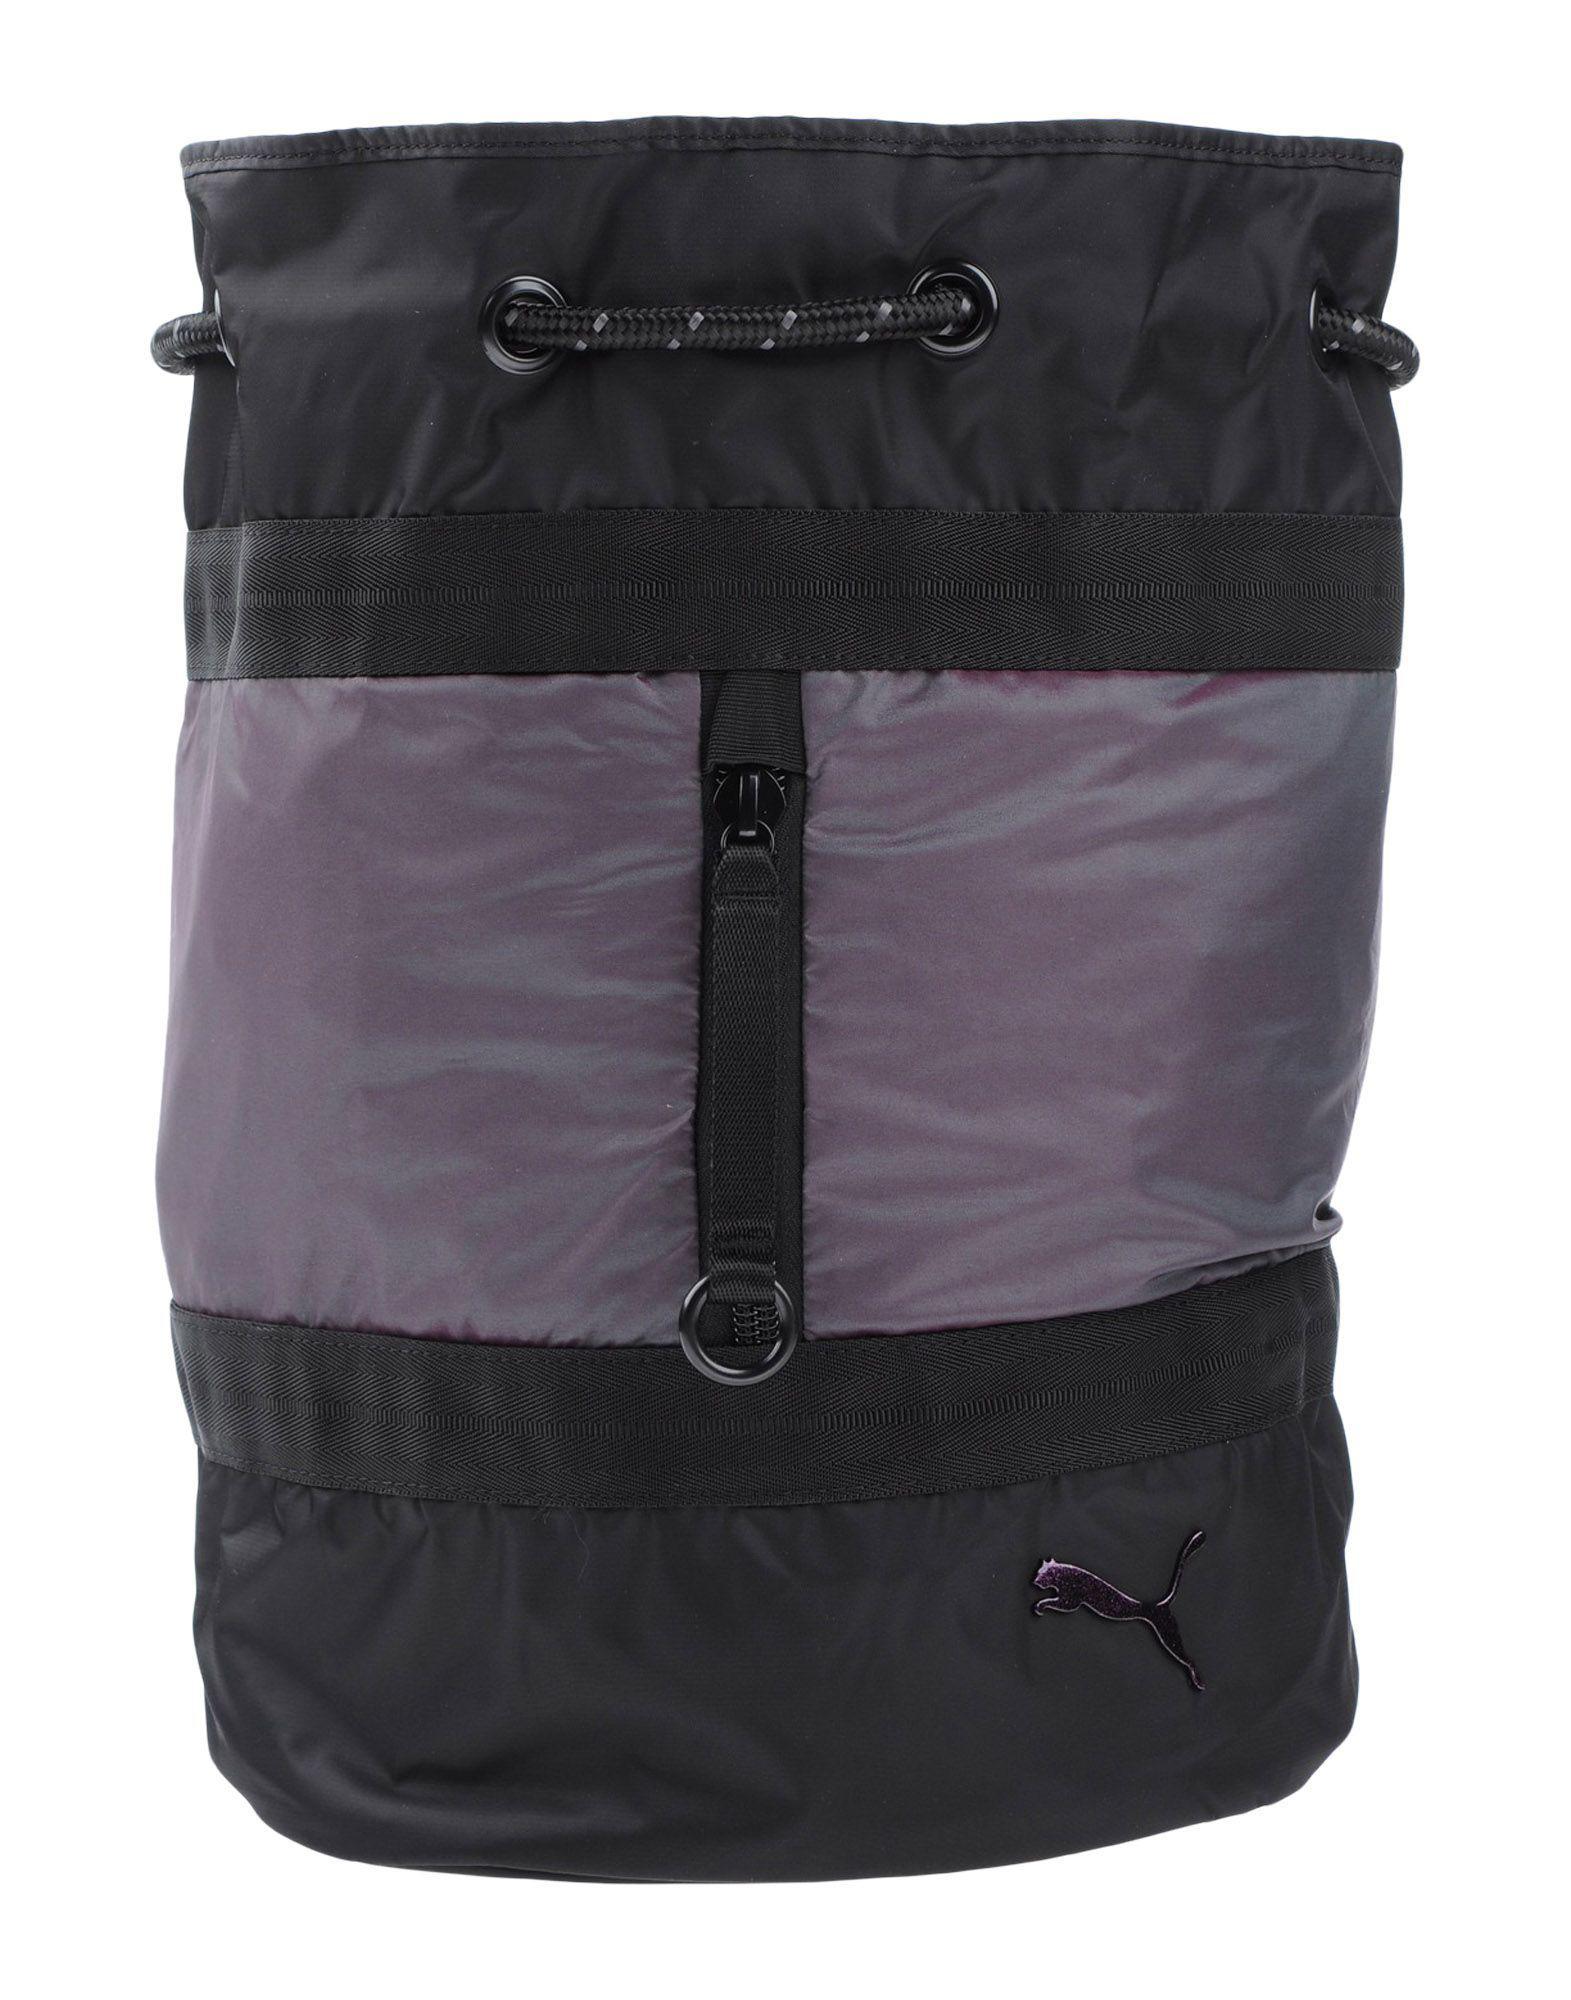 44d137dd2a PUMA. Women s Handbag